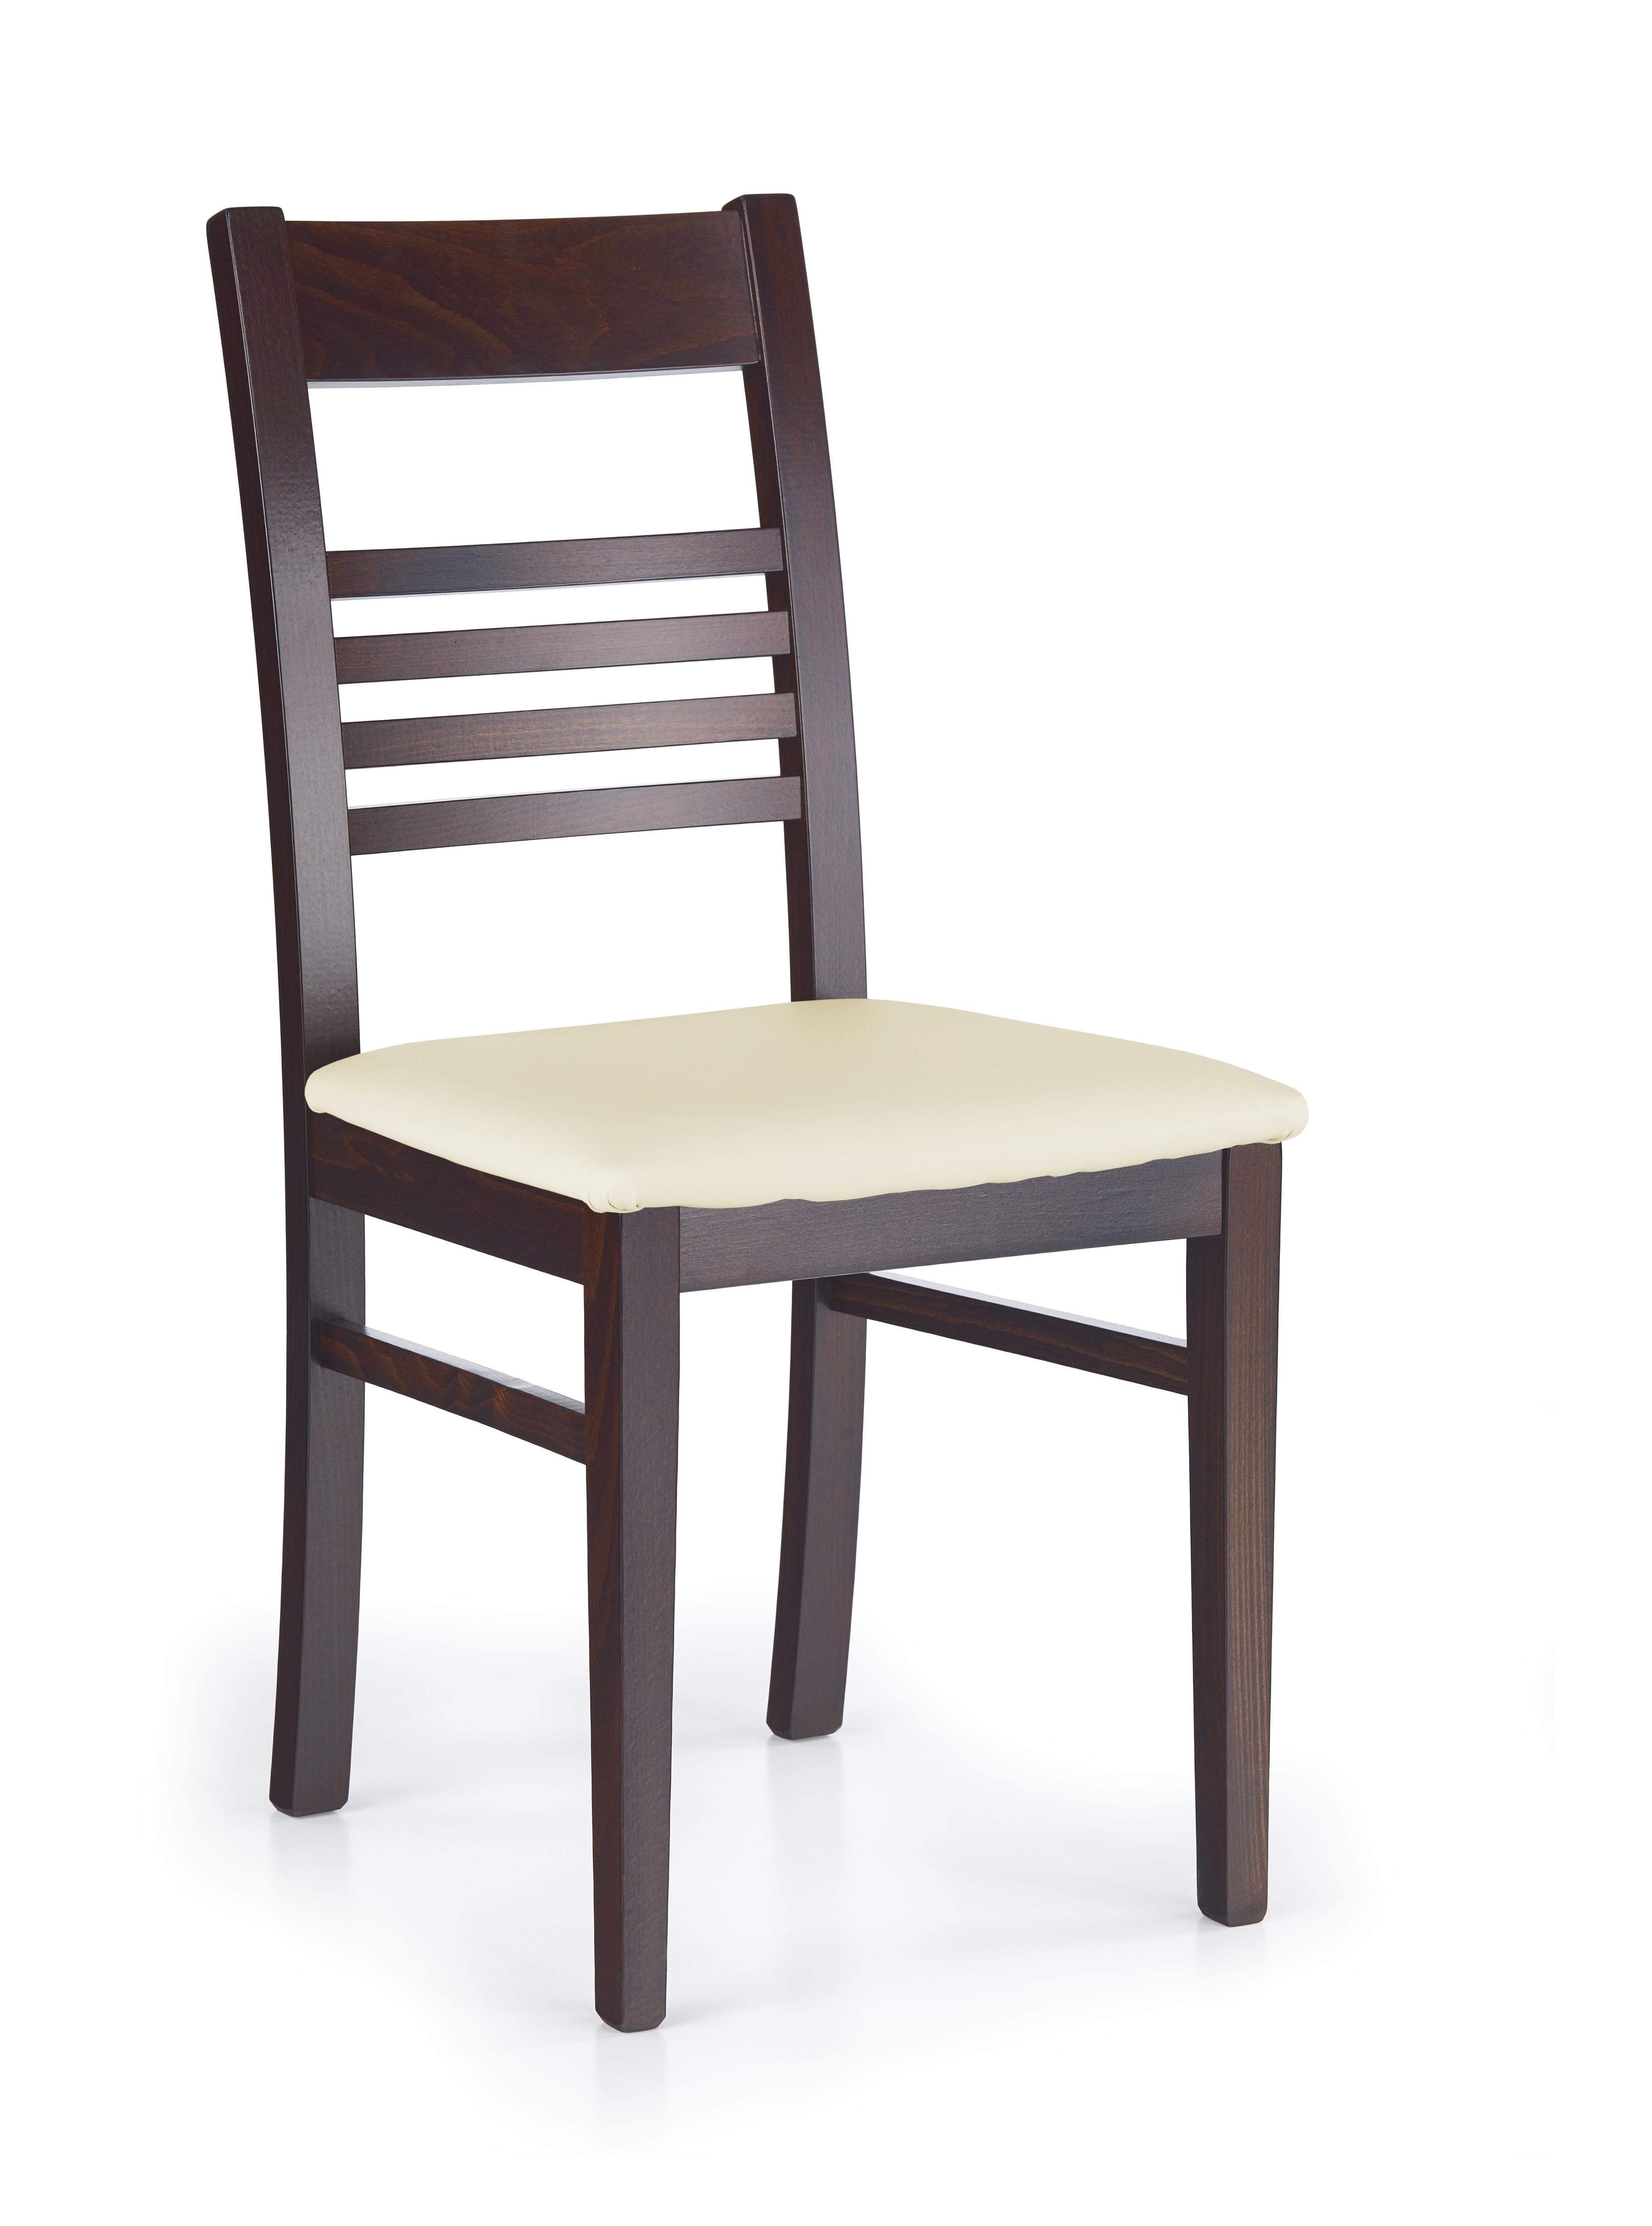 Jedálenská stolička - Halmar - JULIUSZ Orech tmavý + Madryt 111